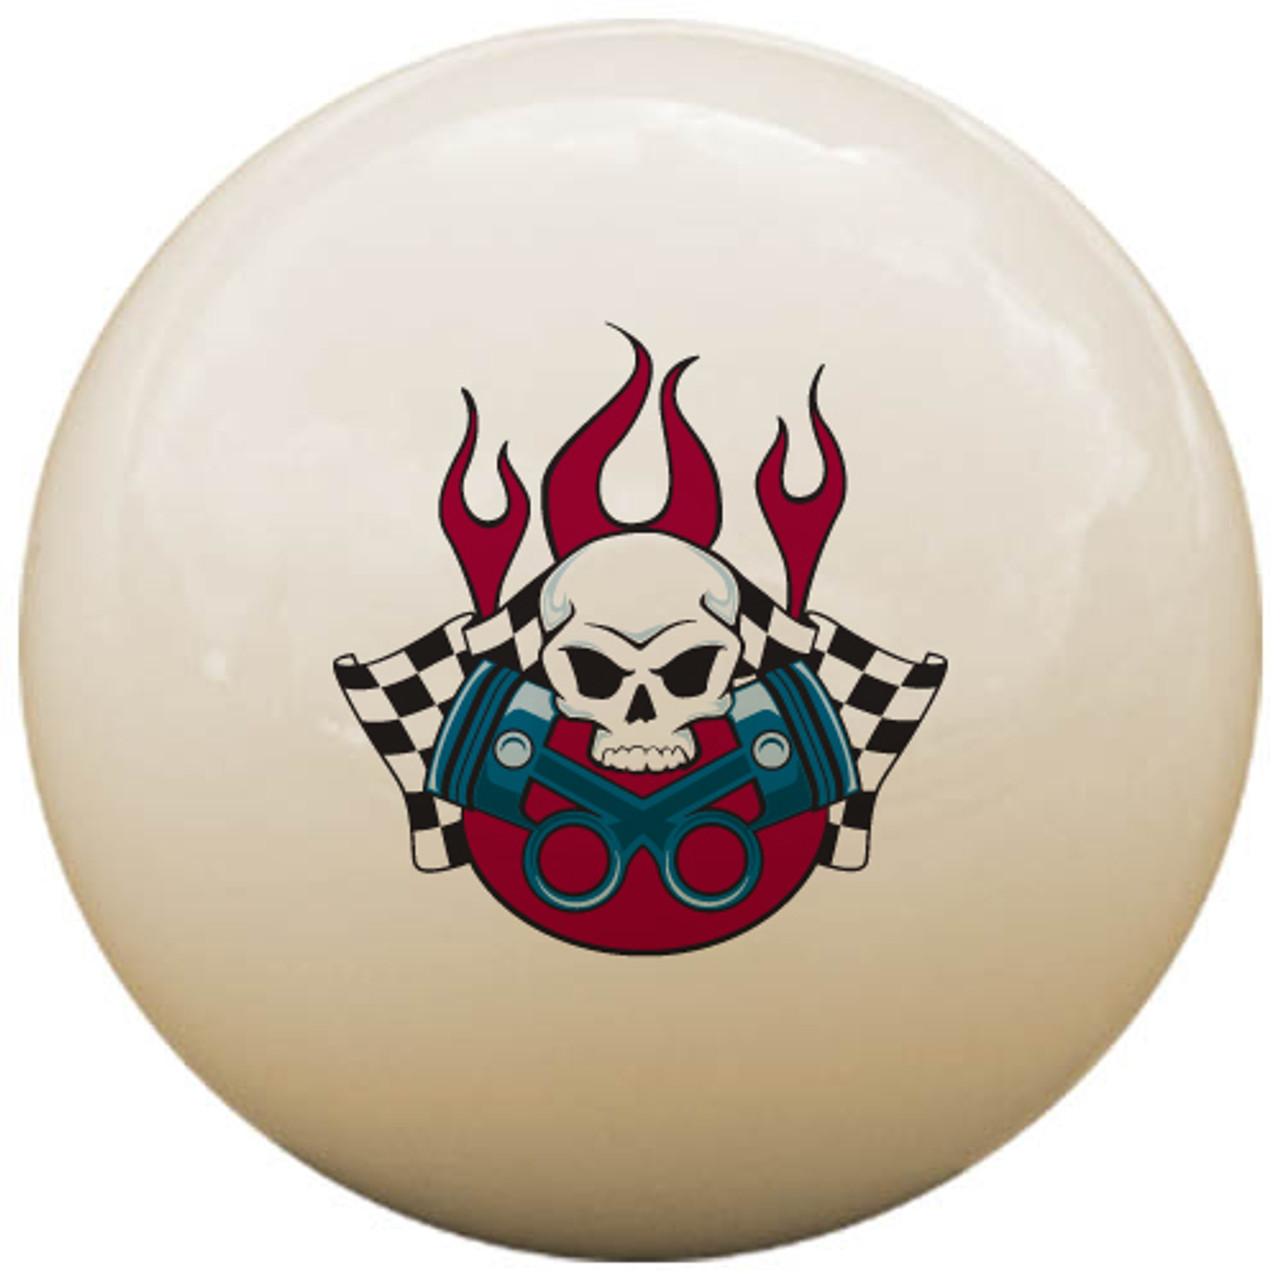 Custom Pool Cue Ball - Gearhead